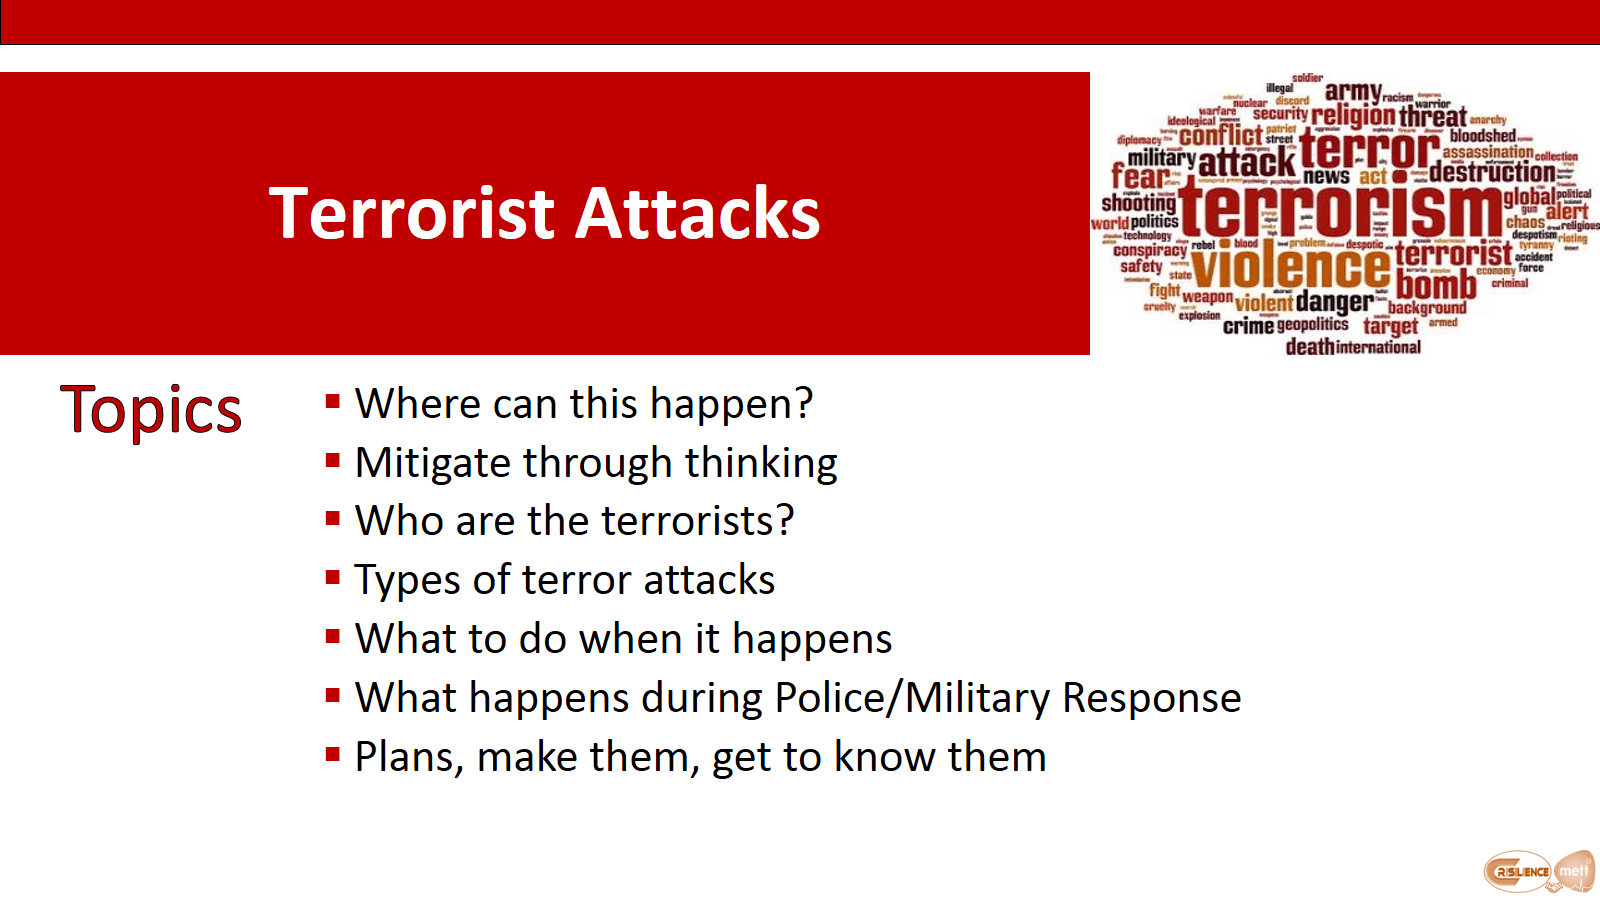 CIMAT Slide 6 Terror Attack Topics